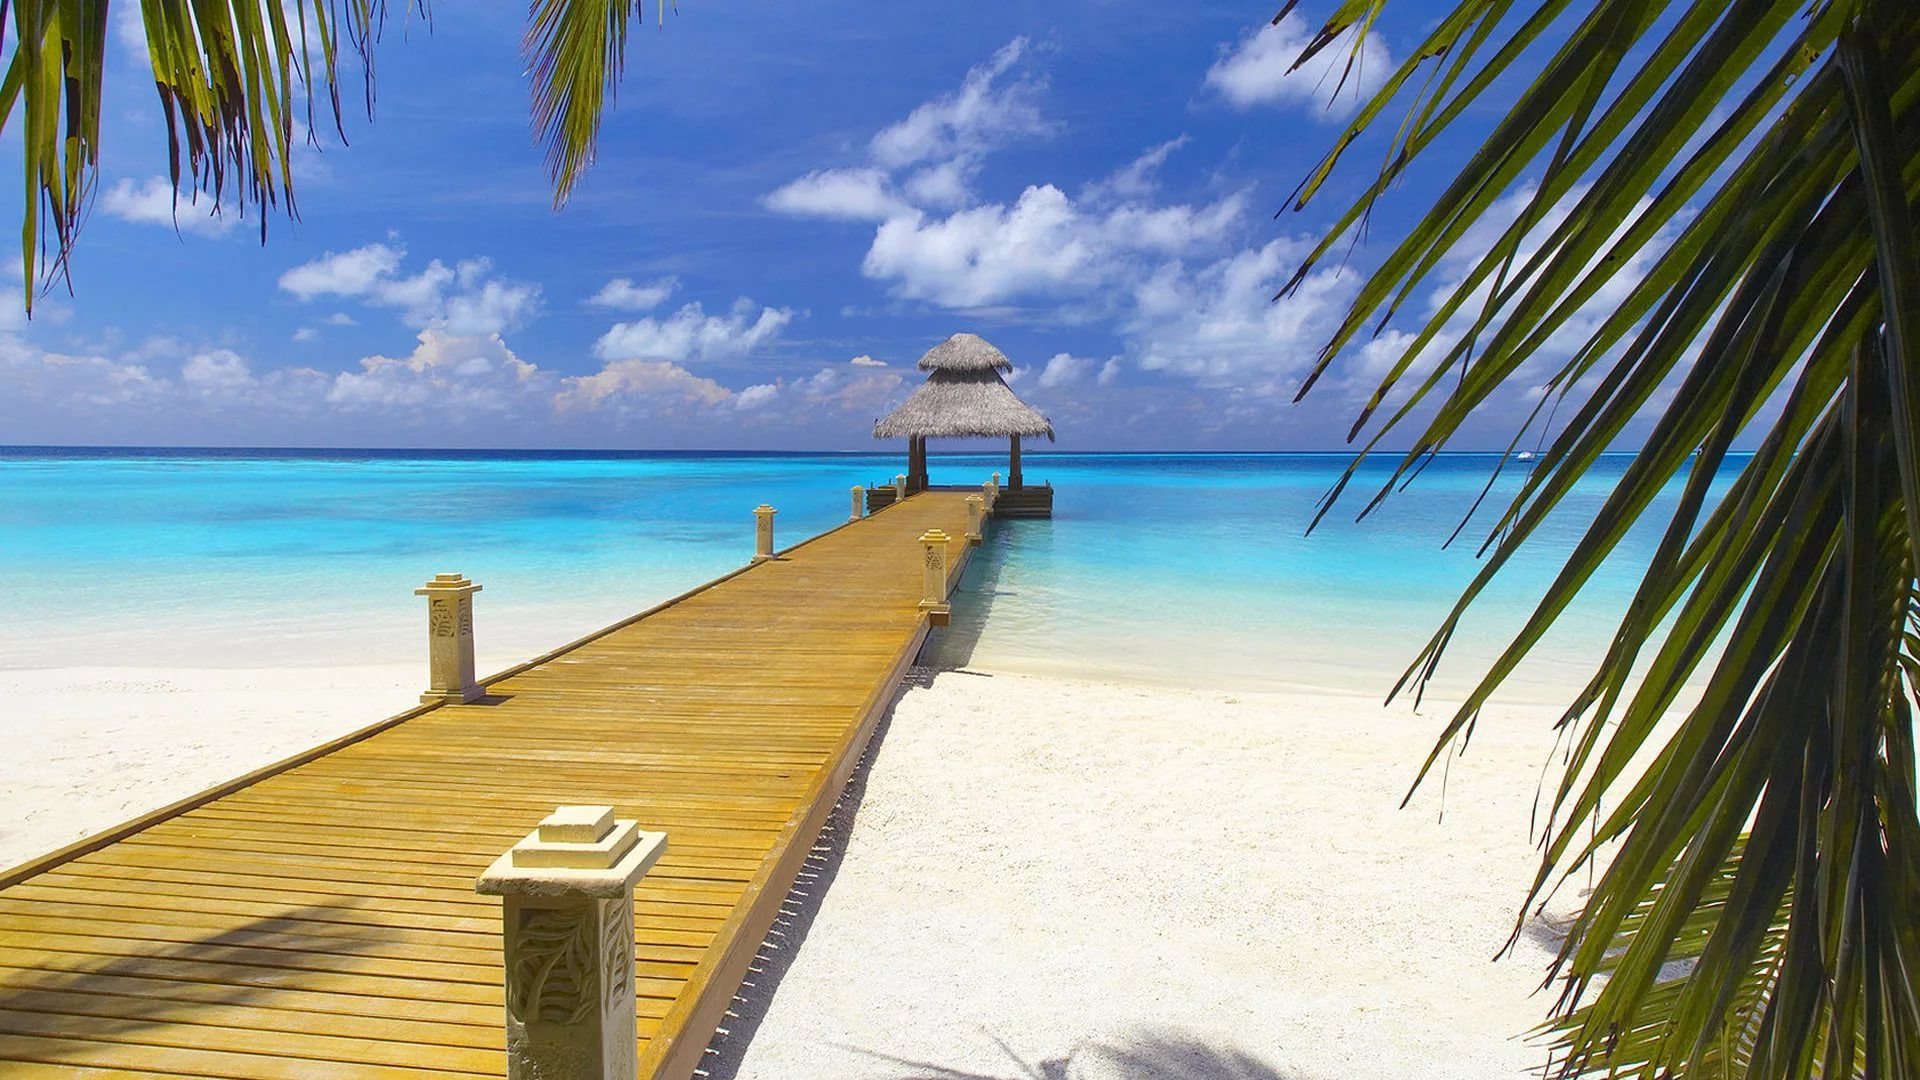 Cancun Mexico Image